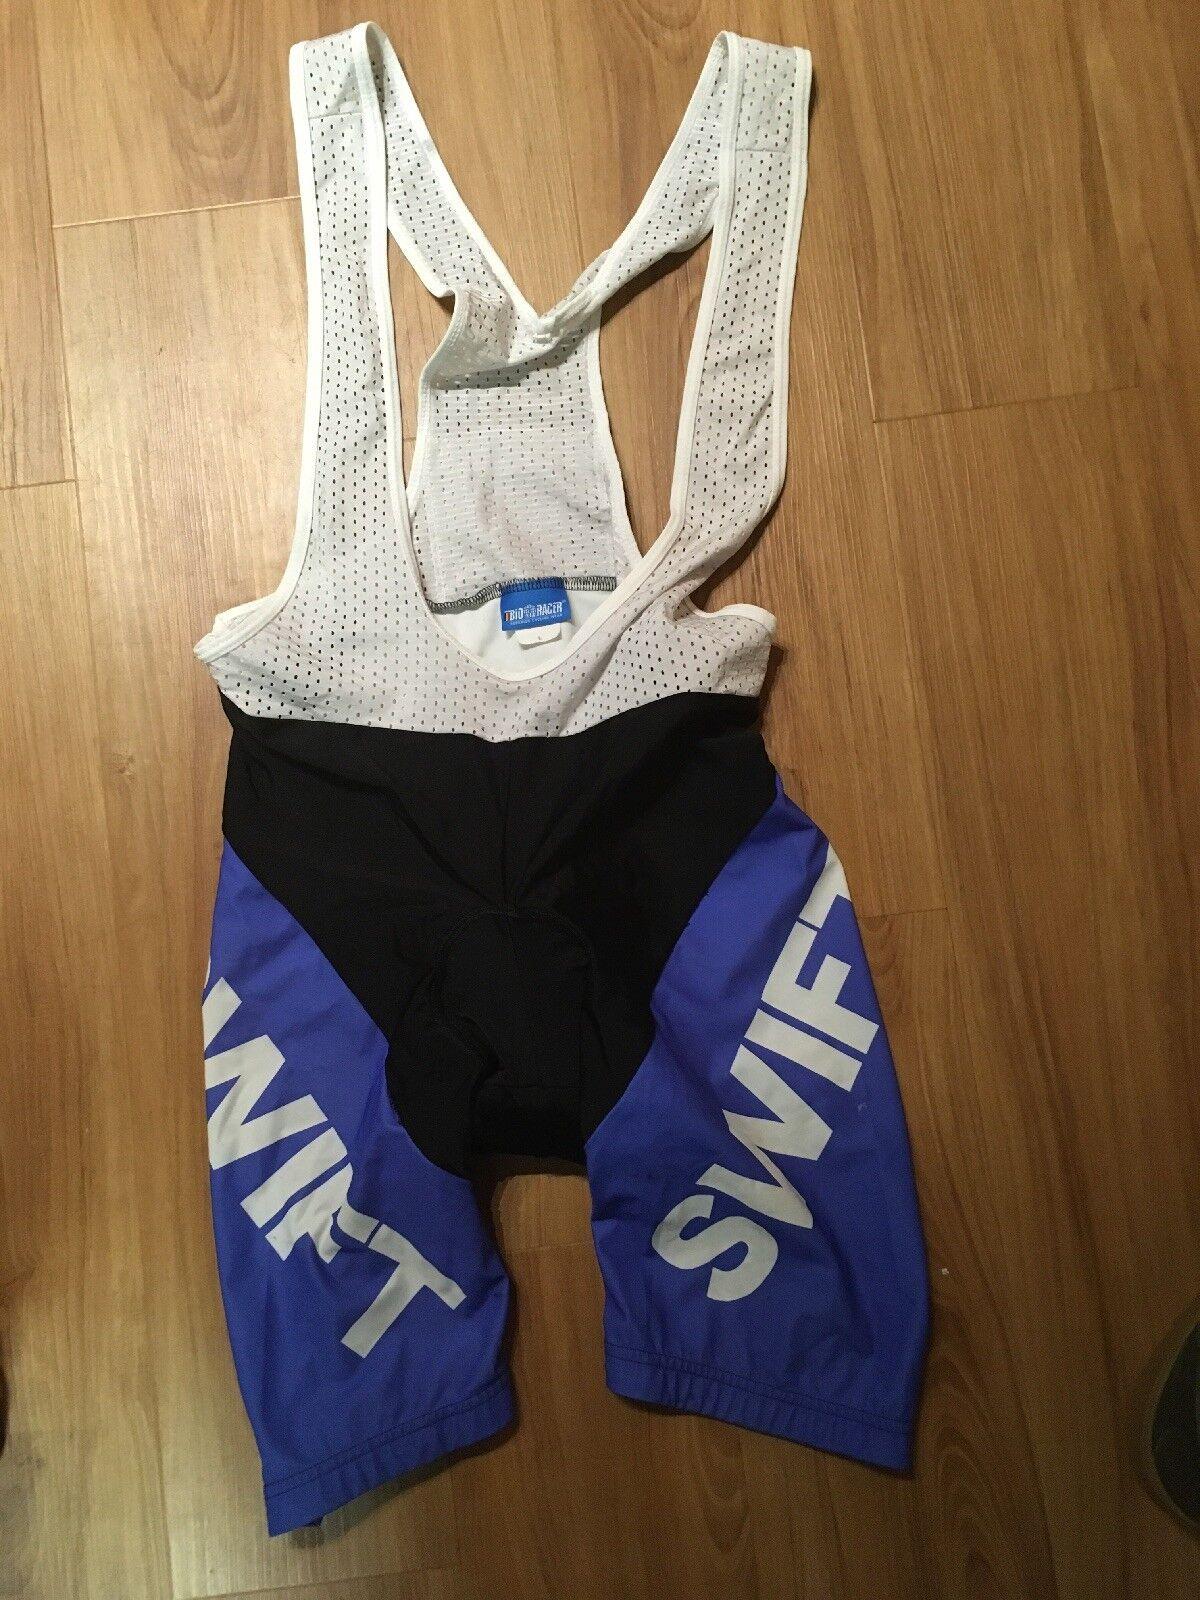 Bioracer Ciclismo Shorts  Cortos Swift Hombre Grande  garantía de crédito